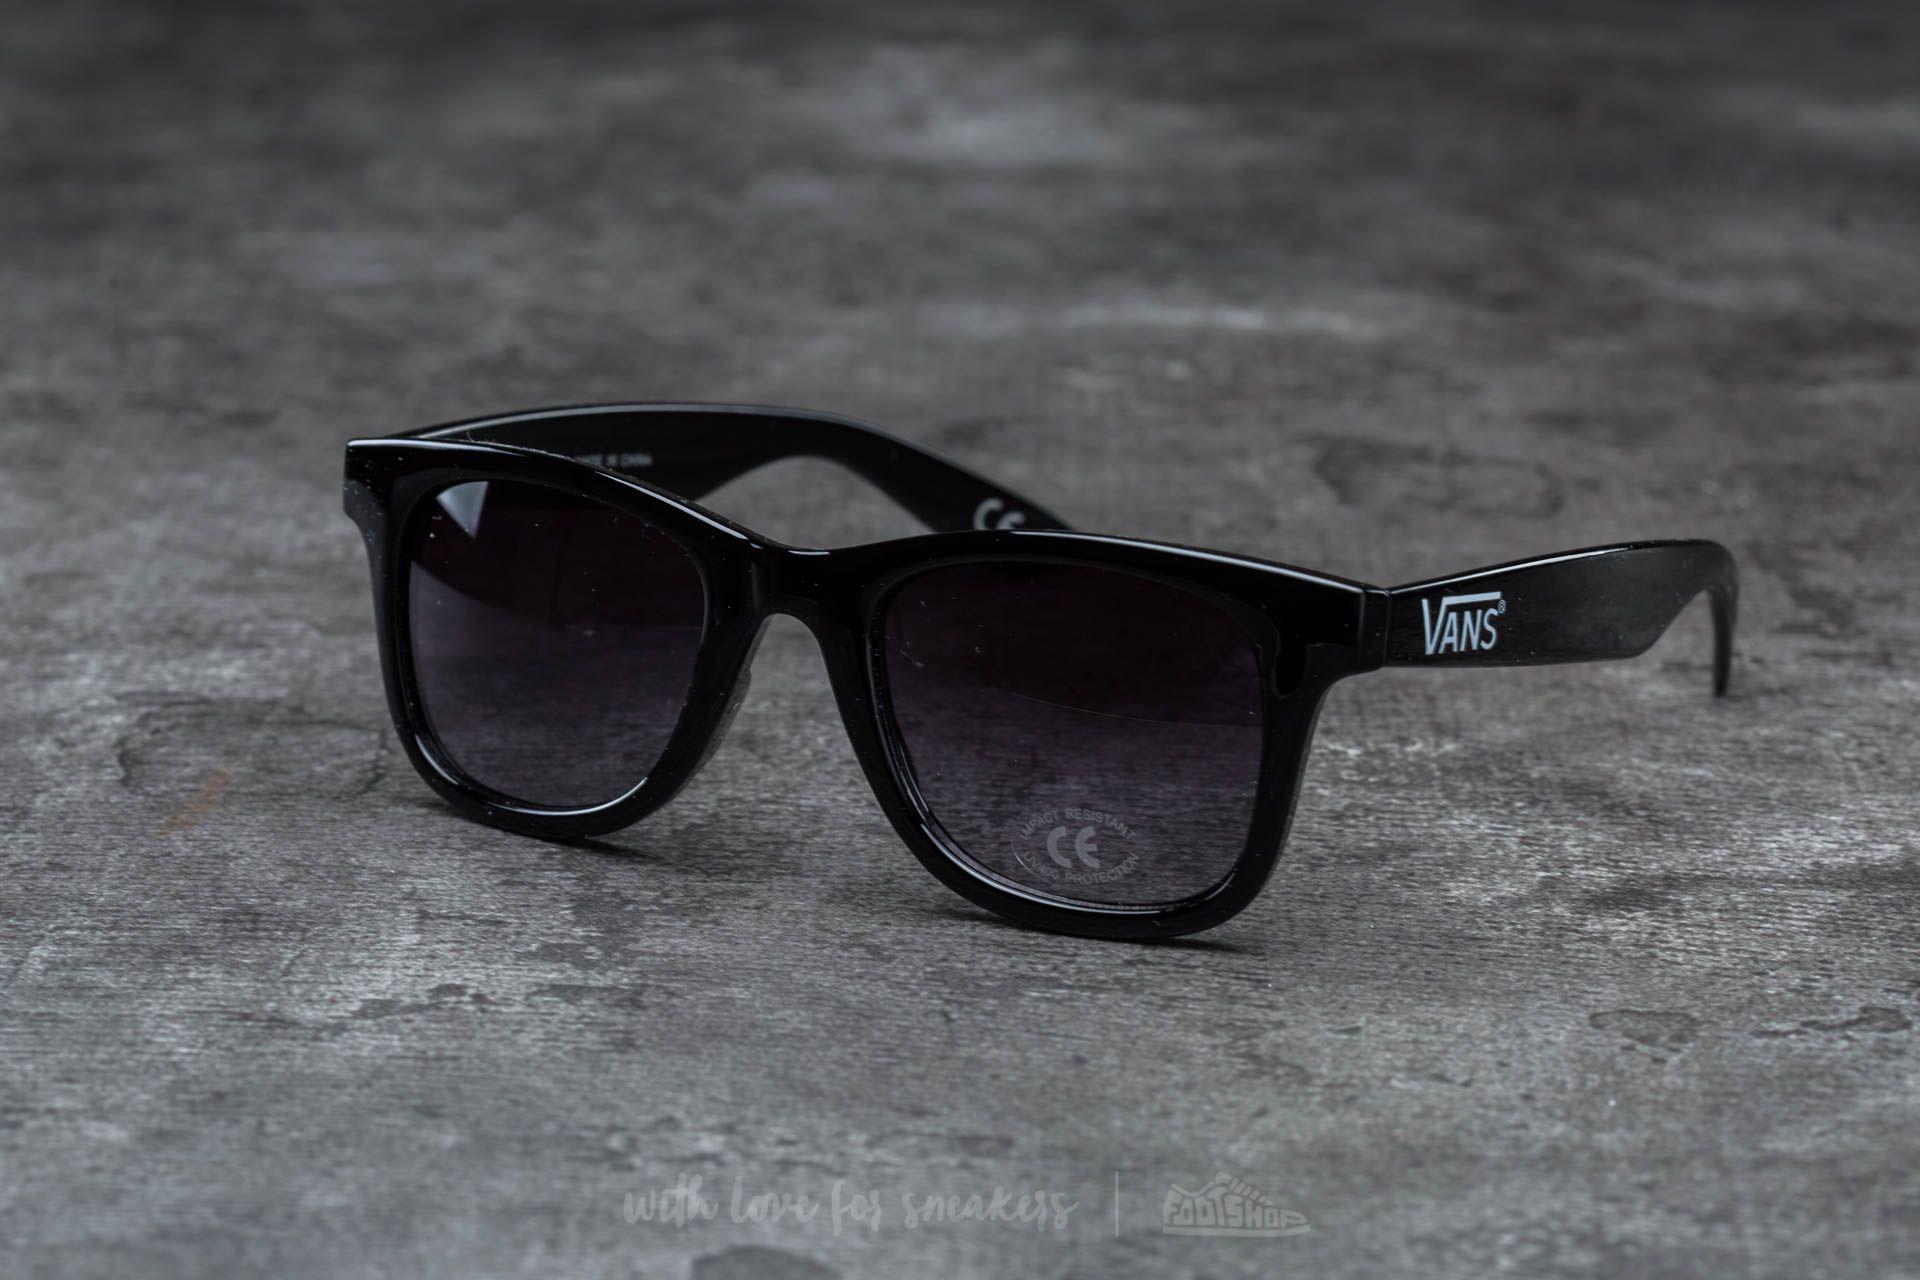 Vans Janelle Hipster Sunglasses Black-Smoke  47fd5e6653a